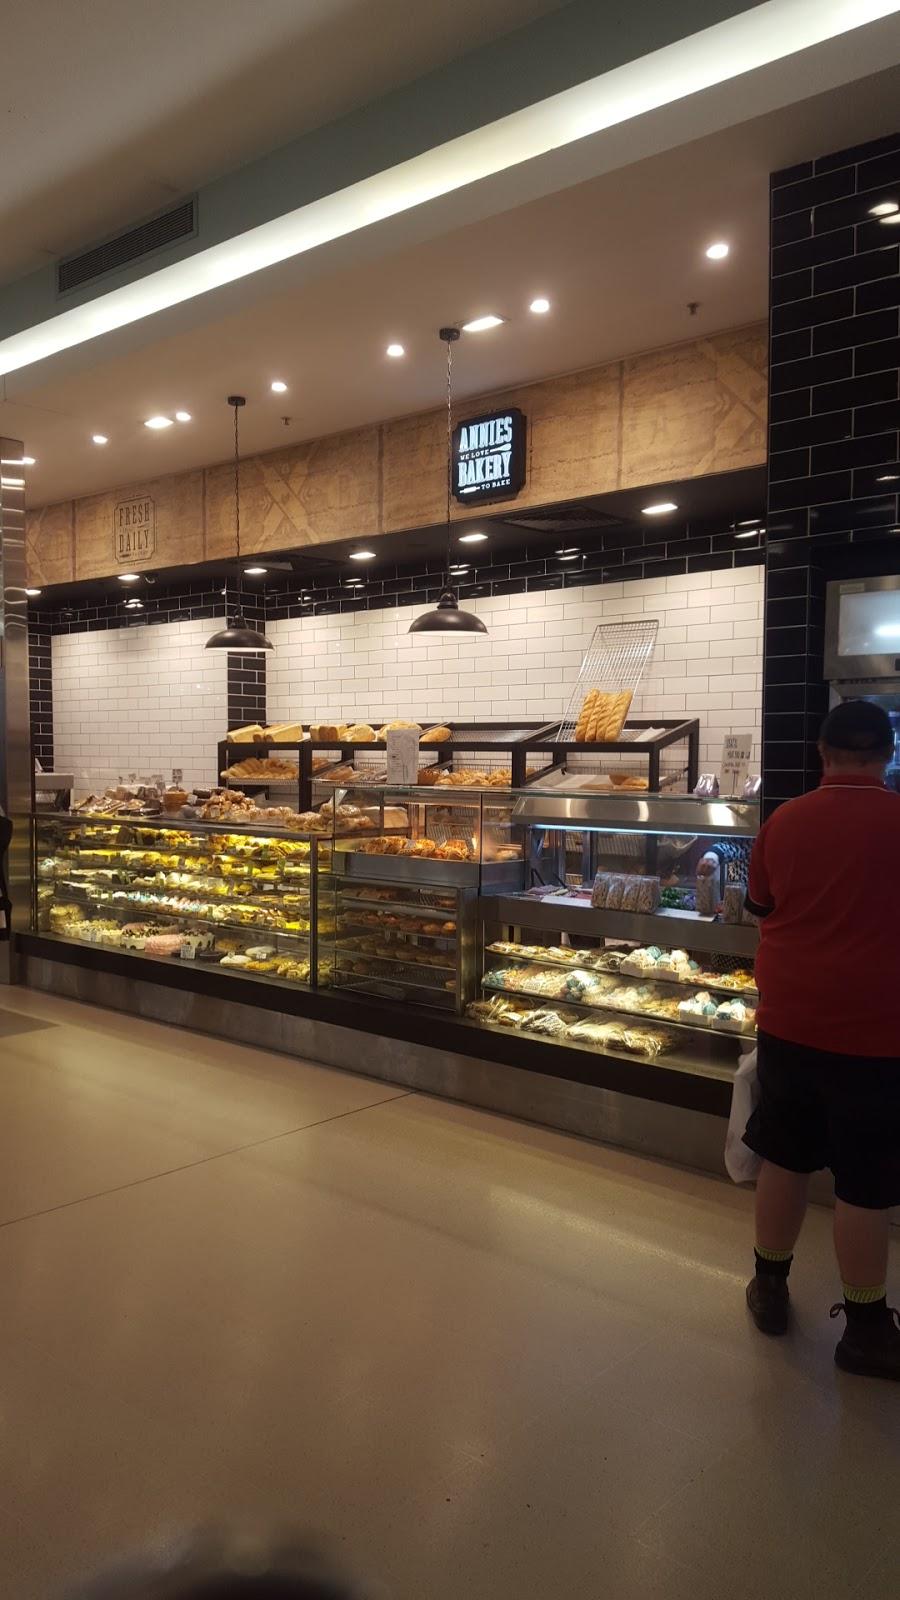 Annies Bakery | bakery | 34/227 George St, Windsor NSW 2756, Australia | 0245775878 OR +61 2 4577 5878